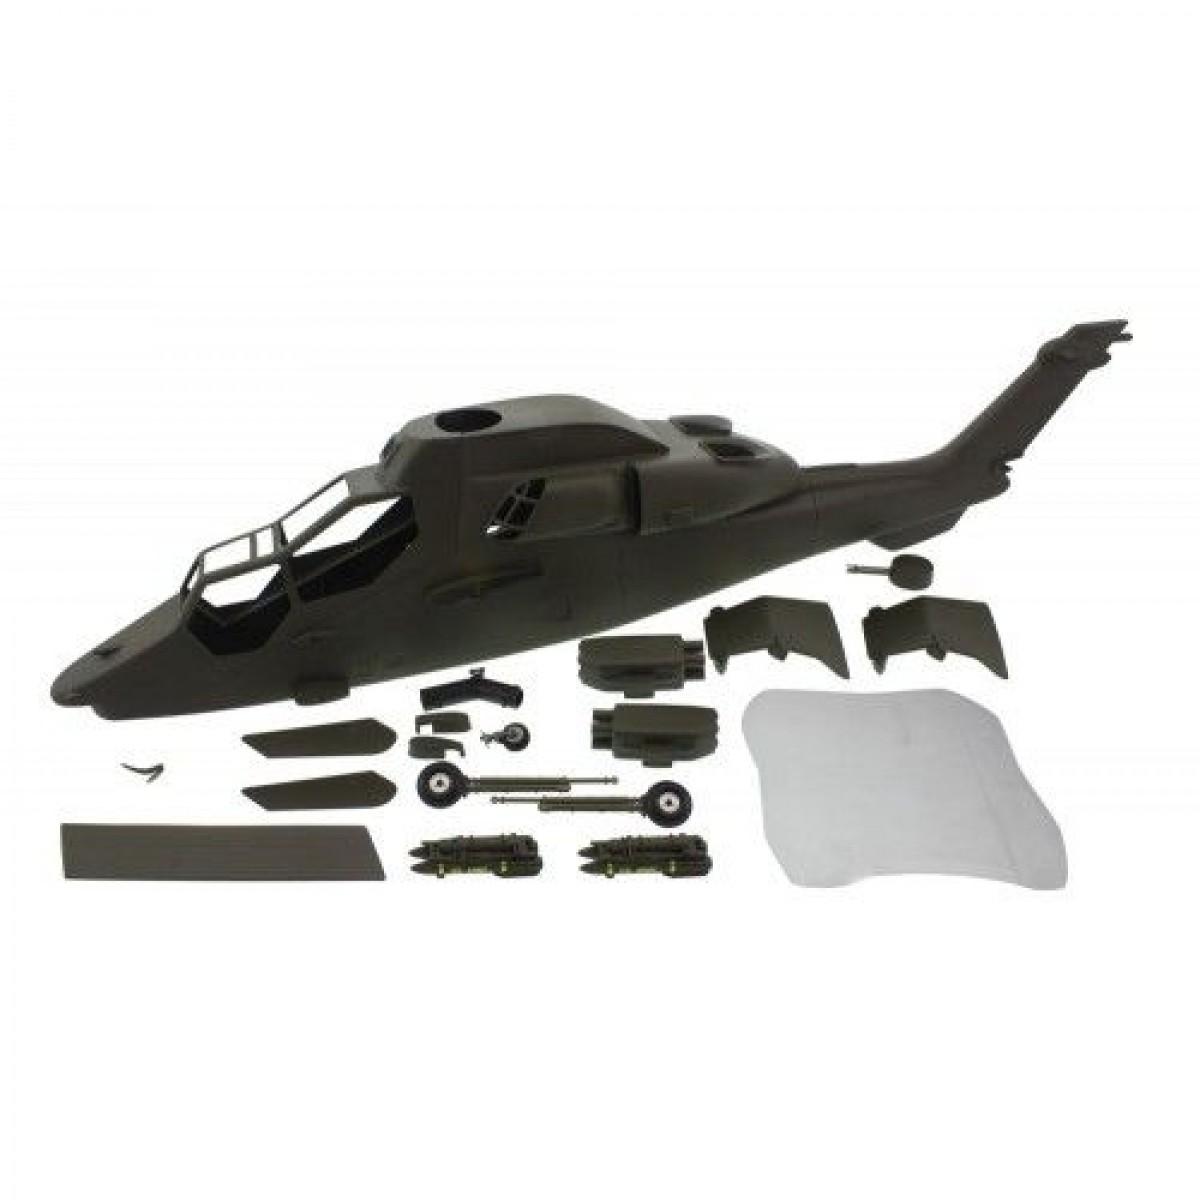 EC665 tiger 600 / 700 size Scale Fuselage